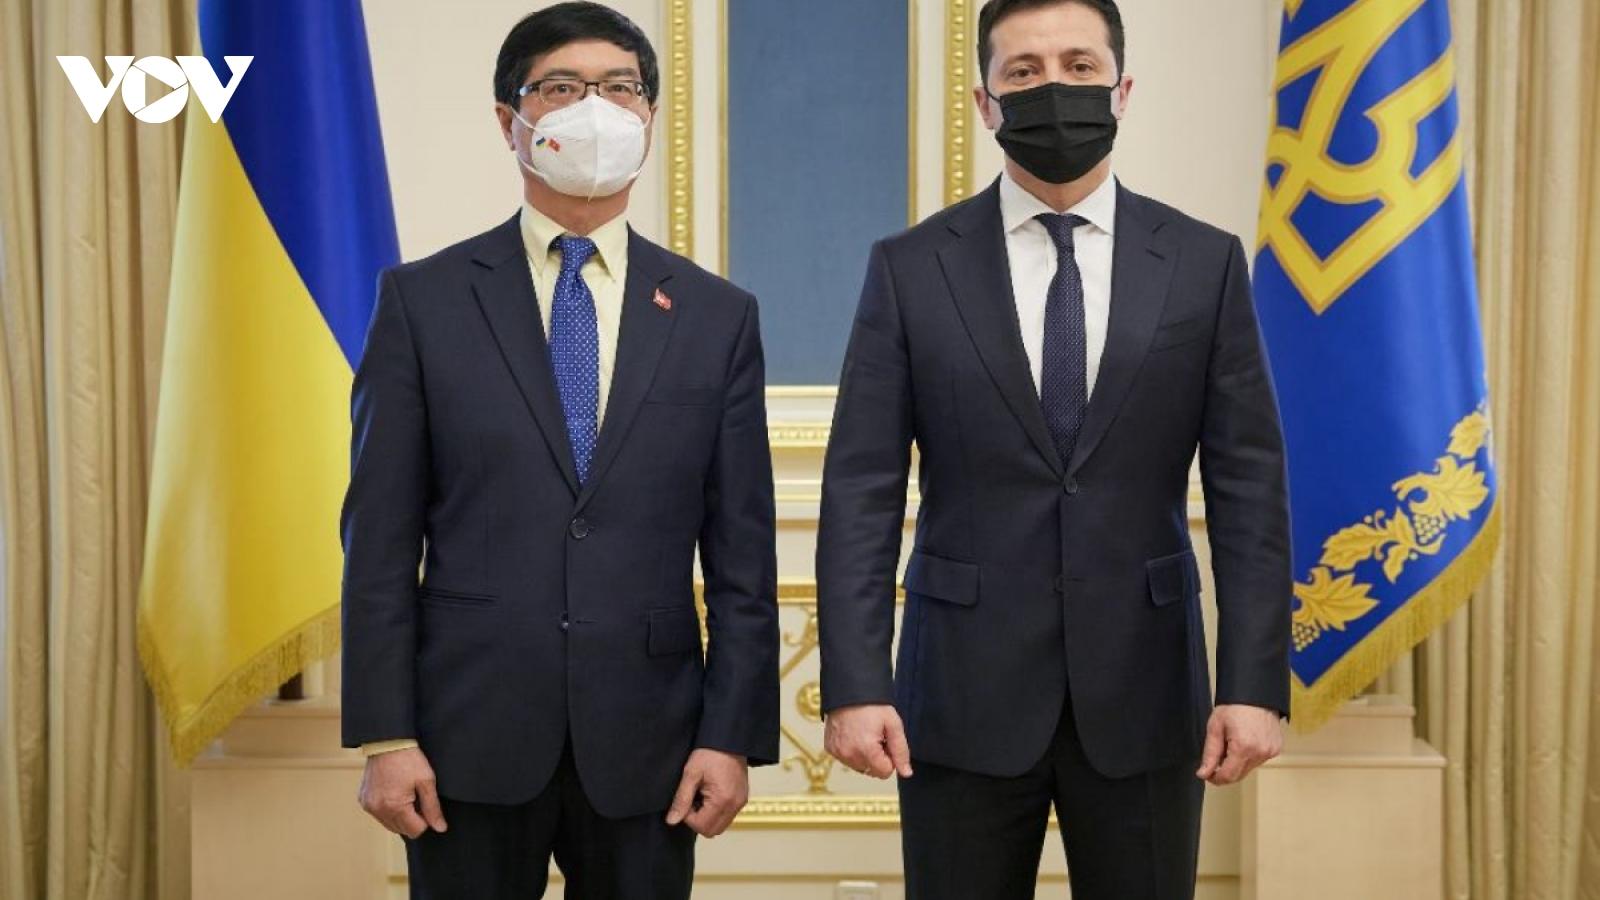 Ukrainian President praises Vietnam's achievements in renewal process